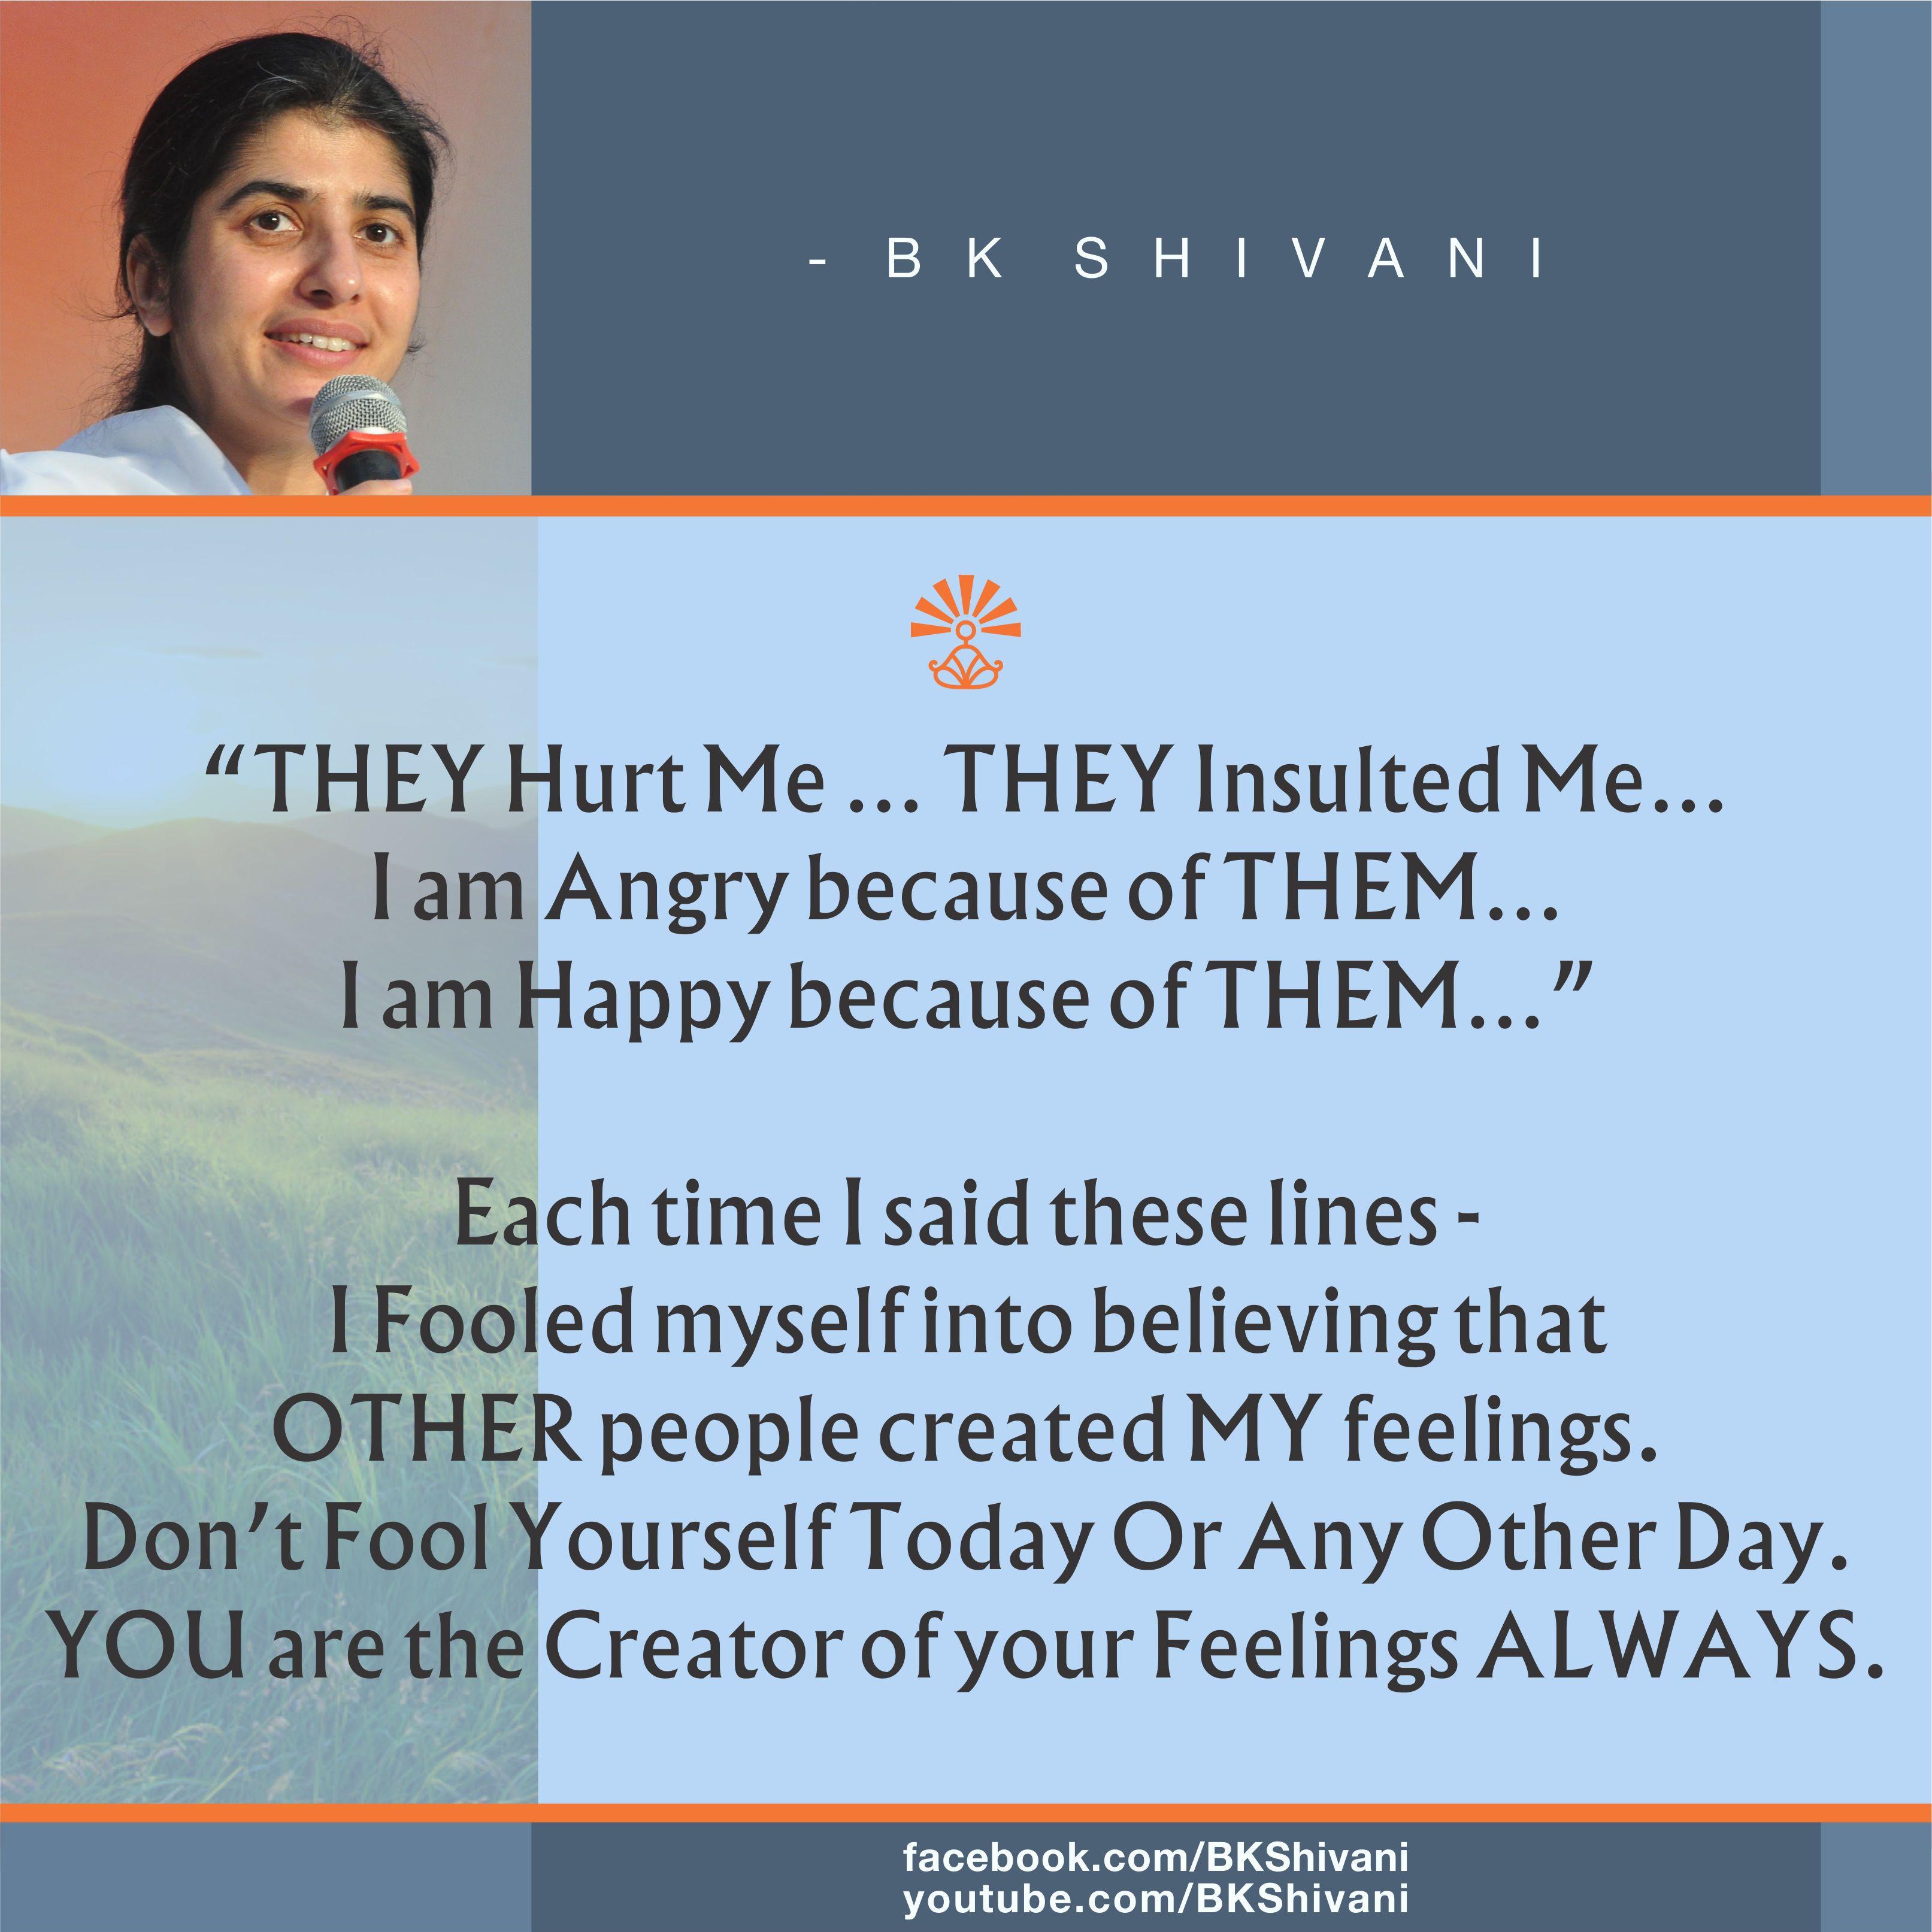 Om shanti B K Shivani Om shanti om Bk shivani t